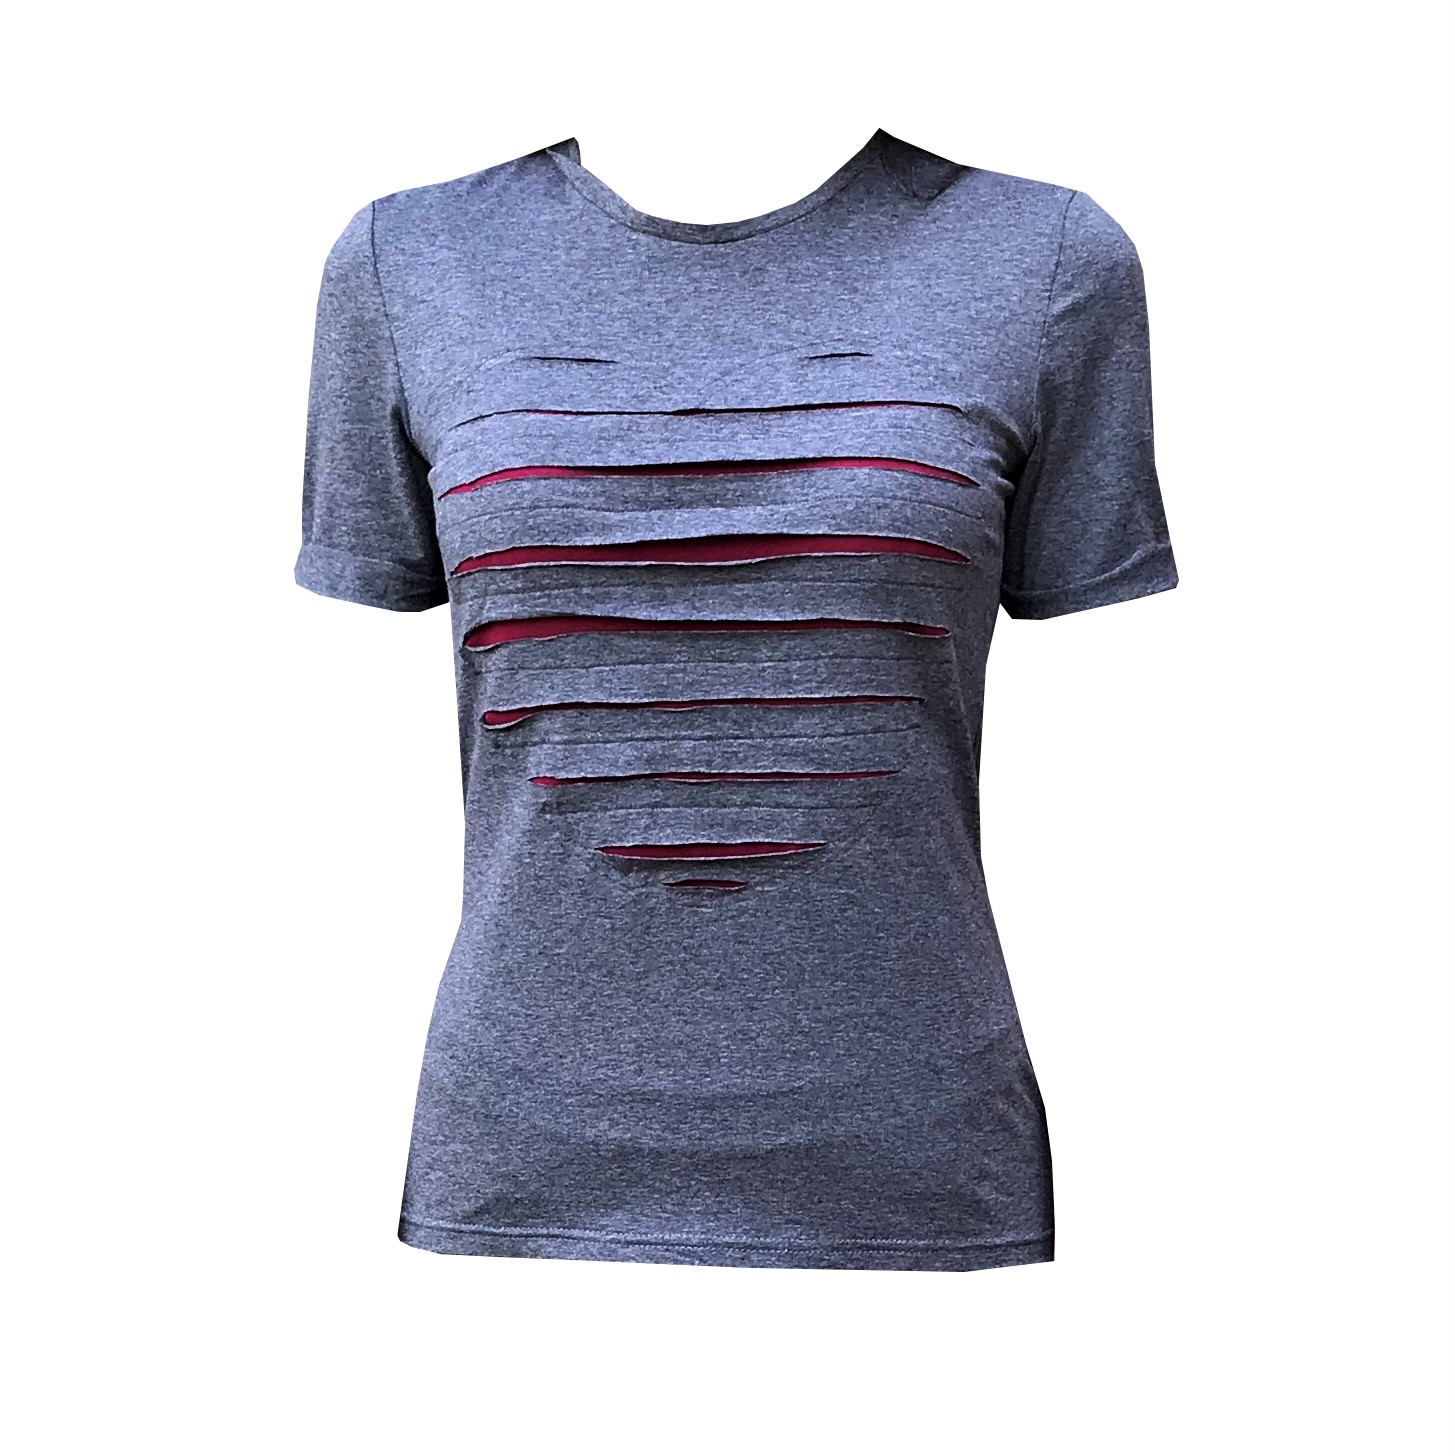 Футболка для йоги женская Yoga Heart Рамайога (0,3 кг, M (46), темно-серый) футболка для йоги женская yoga heart рамайога 0 3 кг xs 42 темно серый